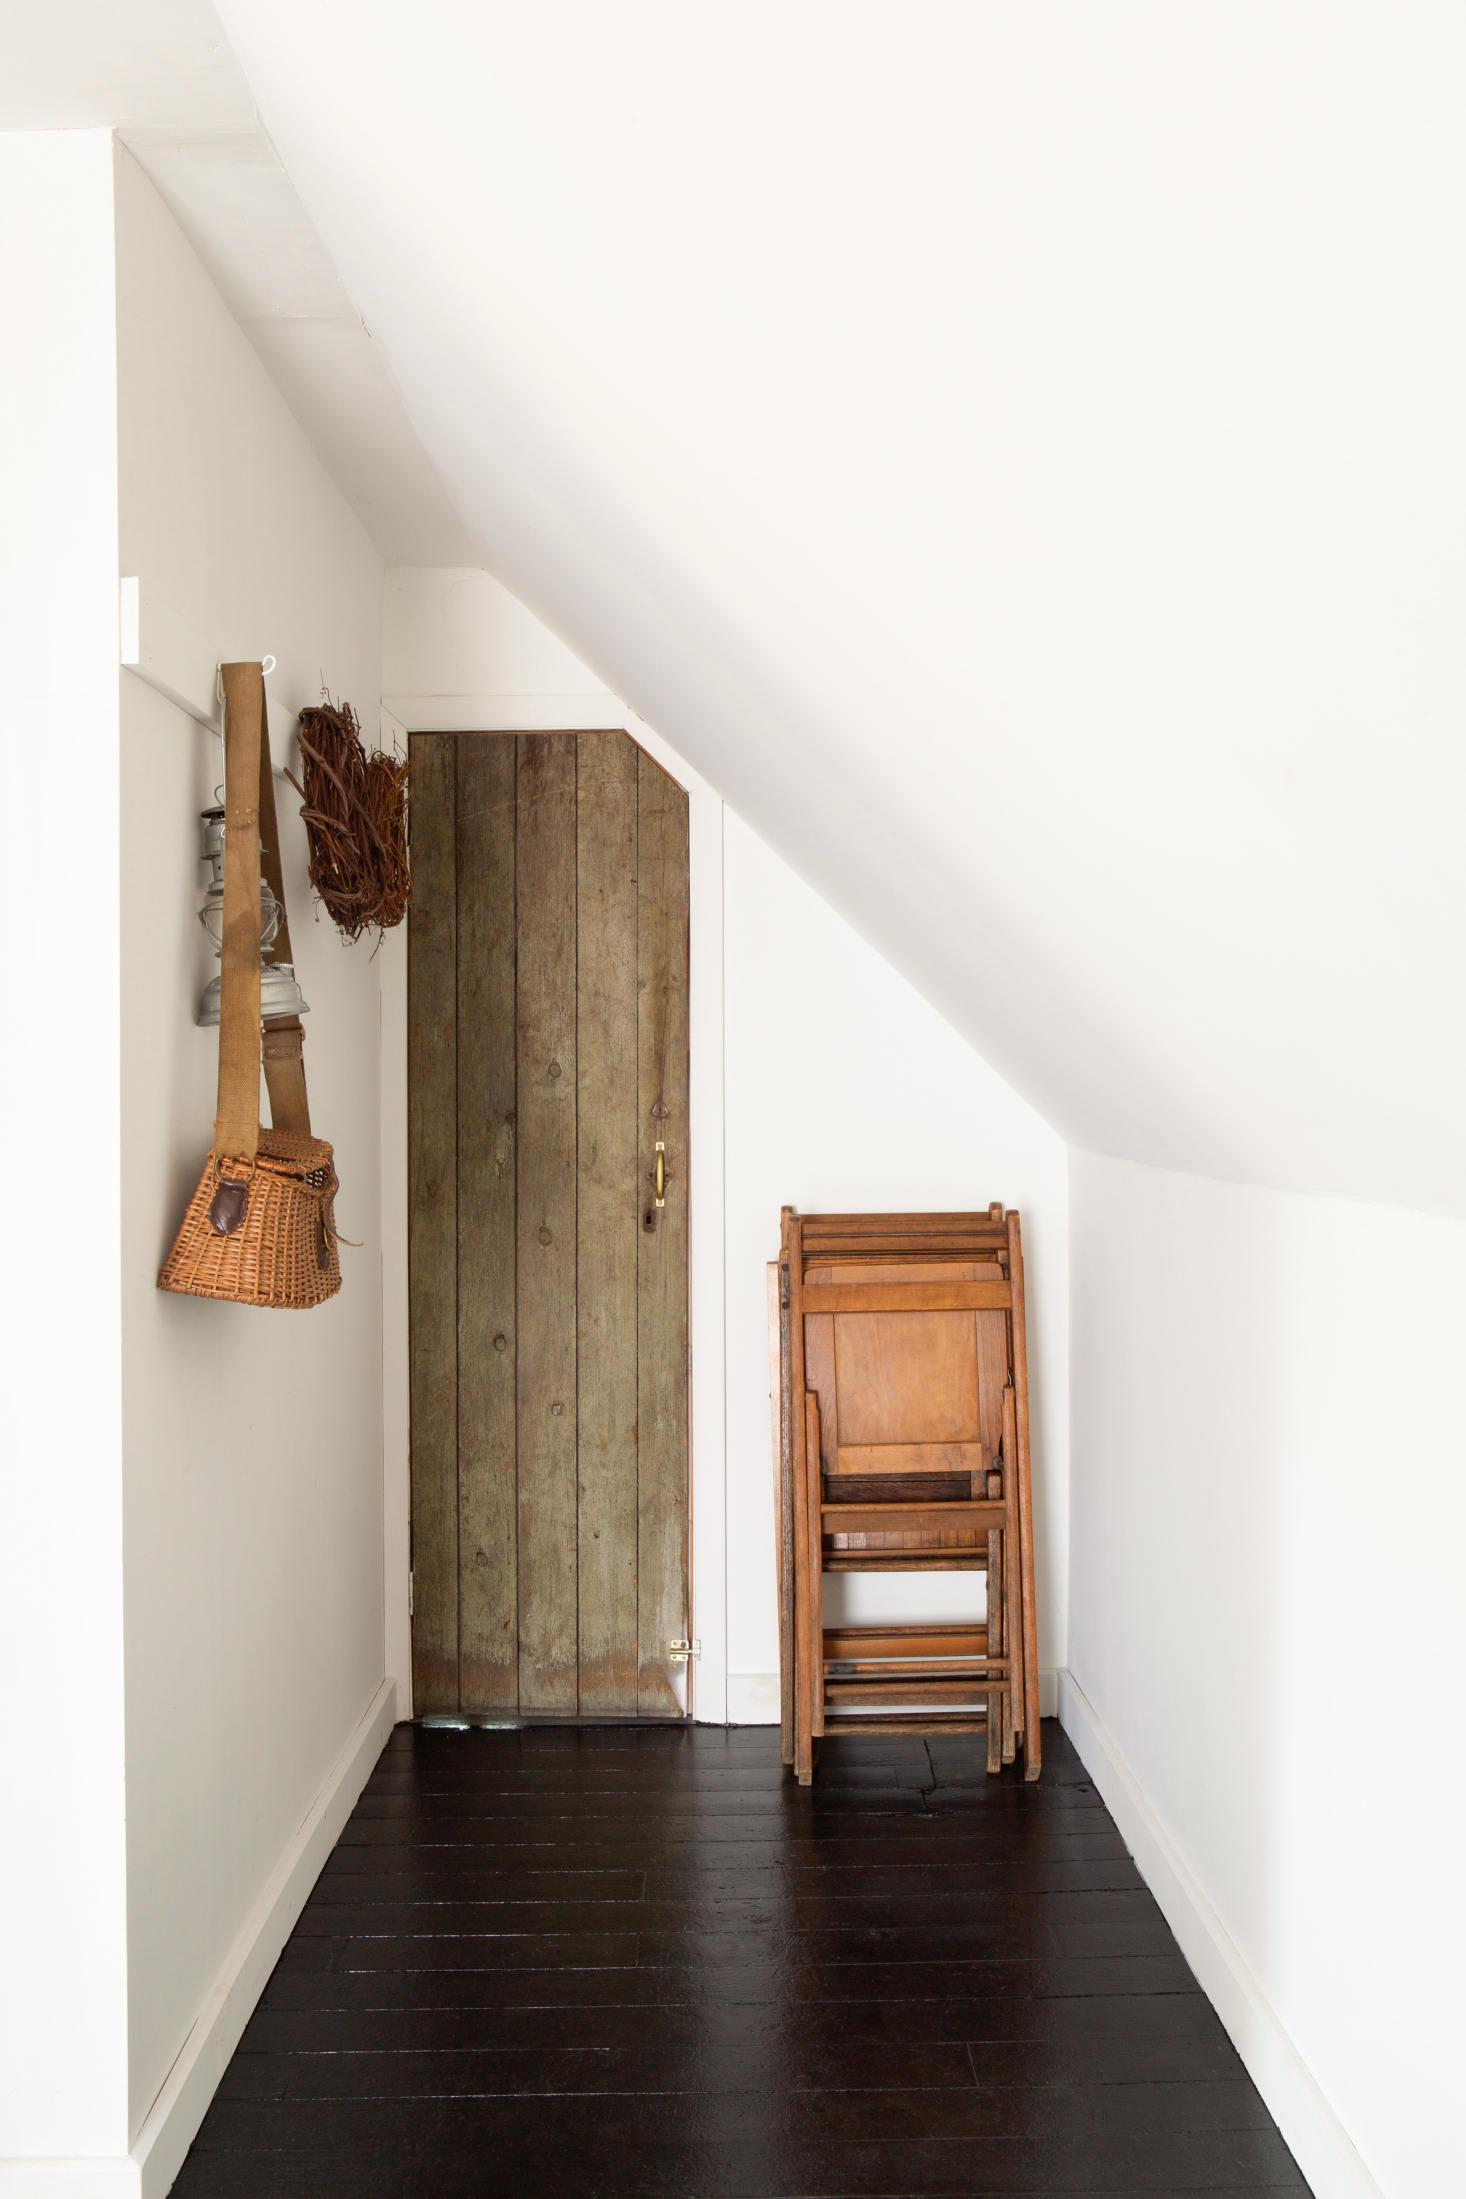 lisa-przystup-attic-doorway-sarah-elliott-1466x2199.jpg